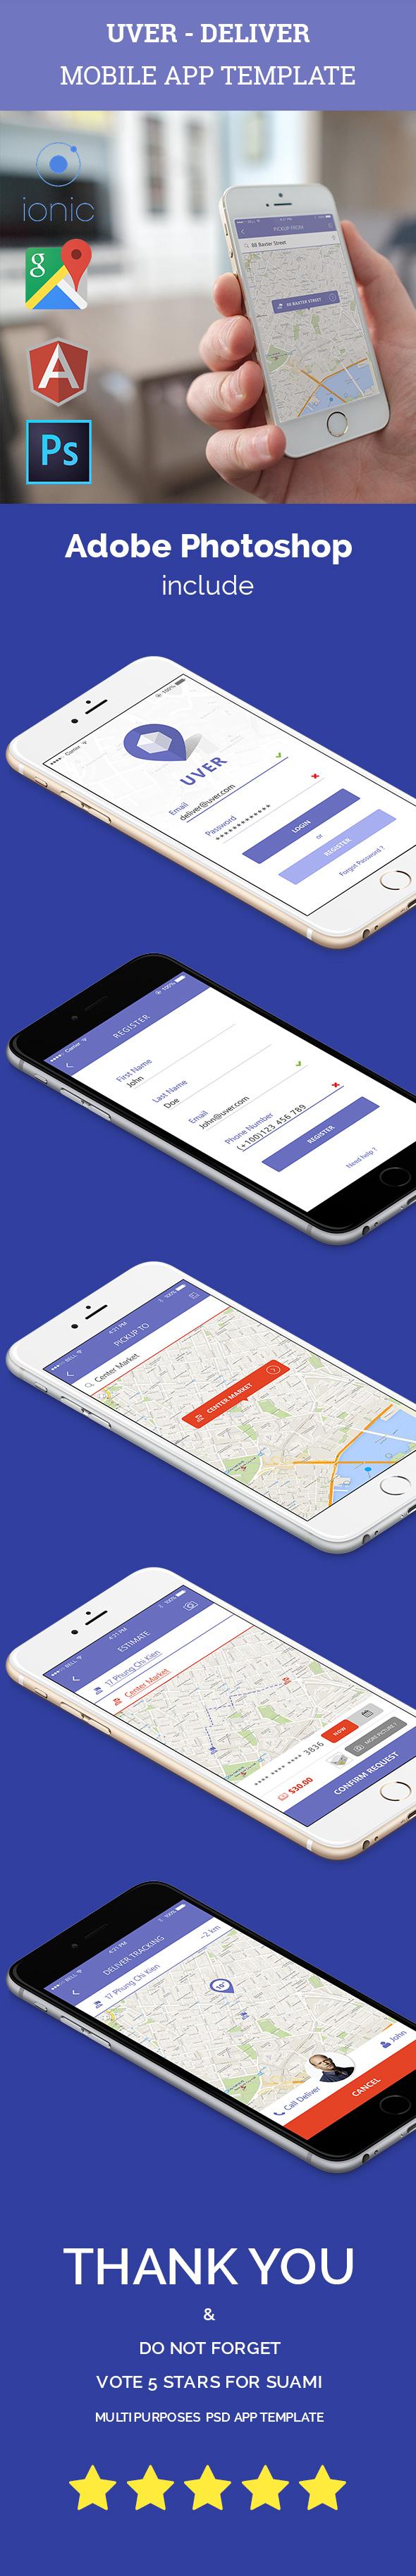 Deliver service app template